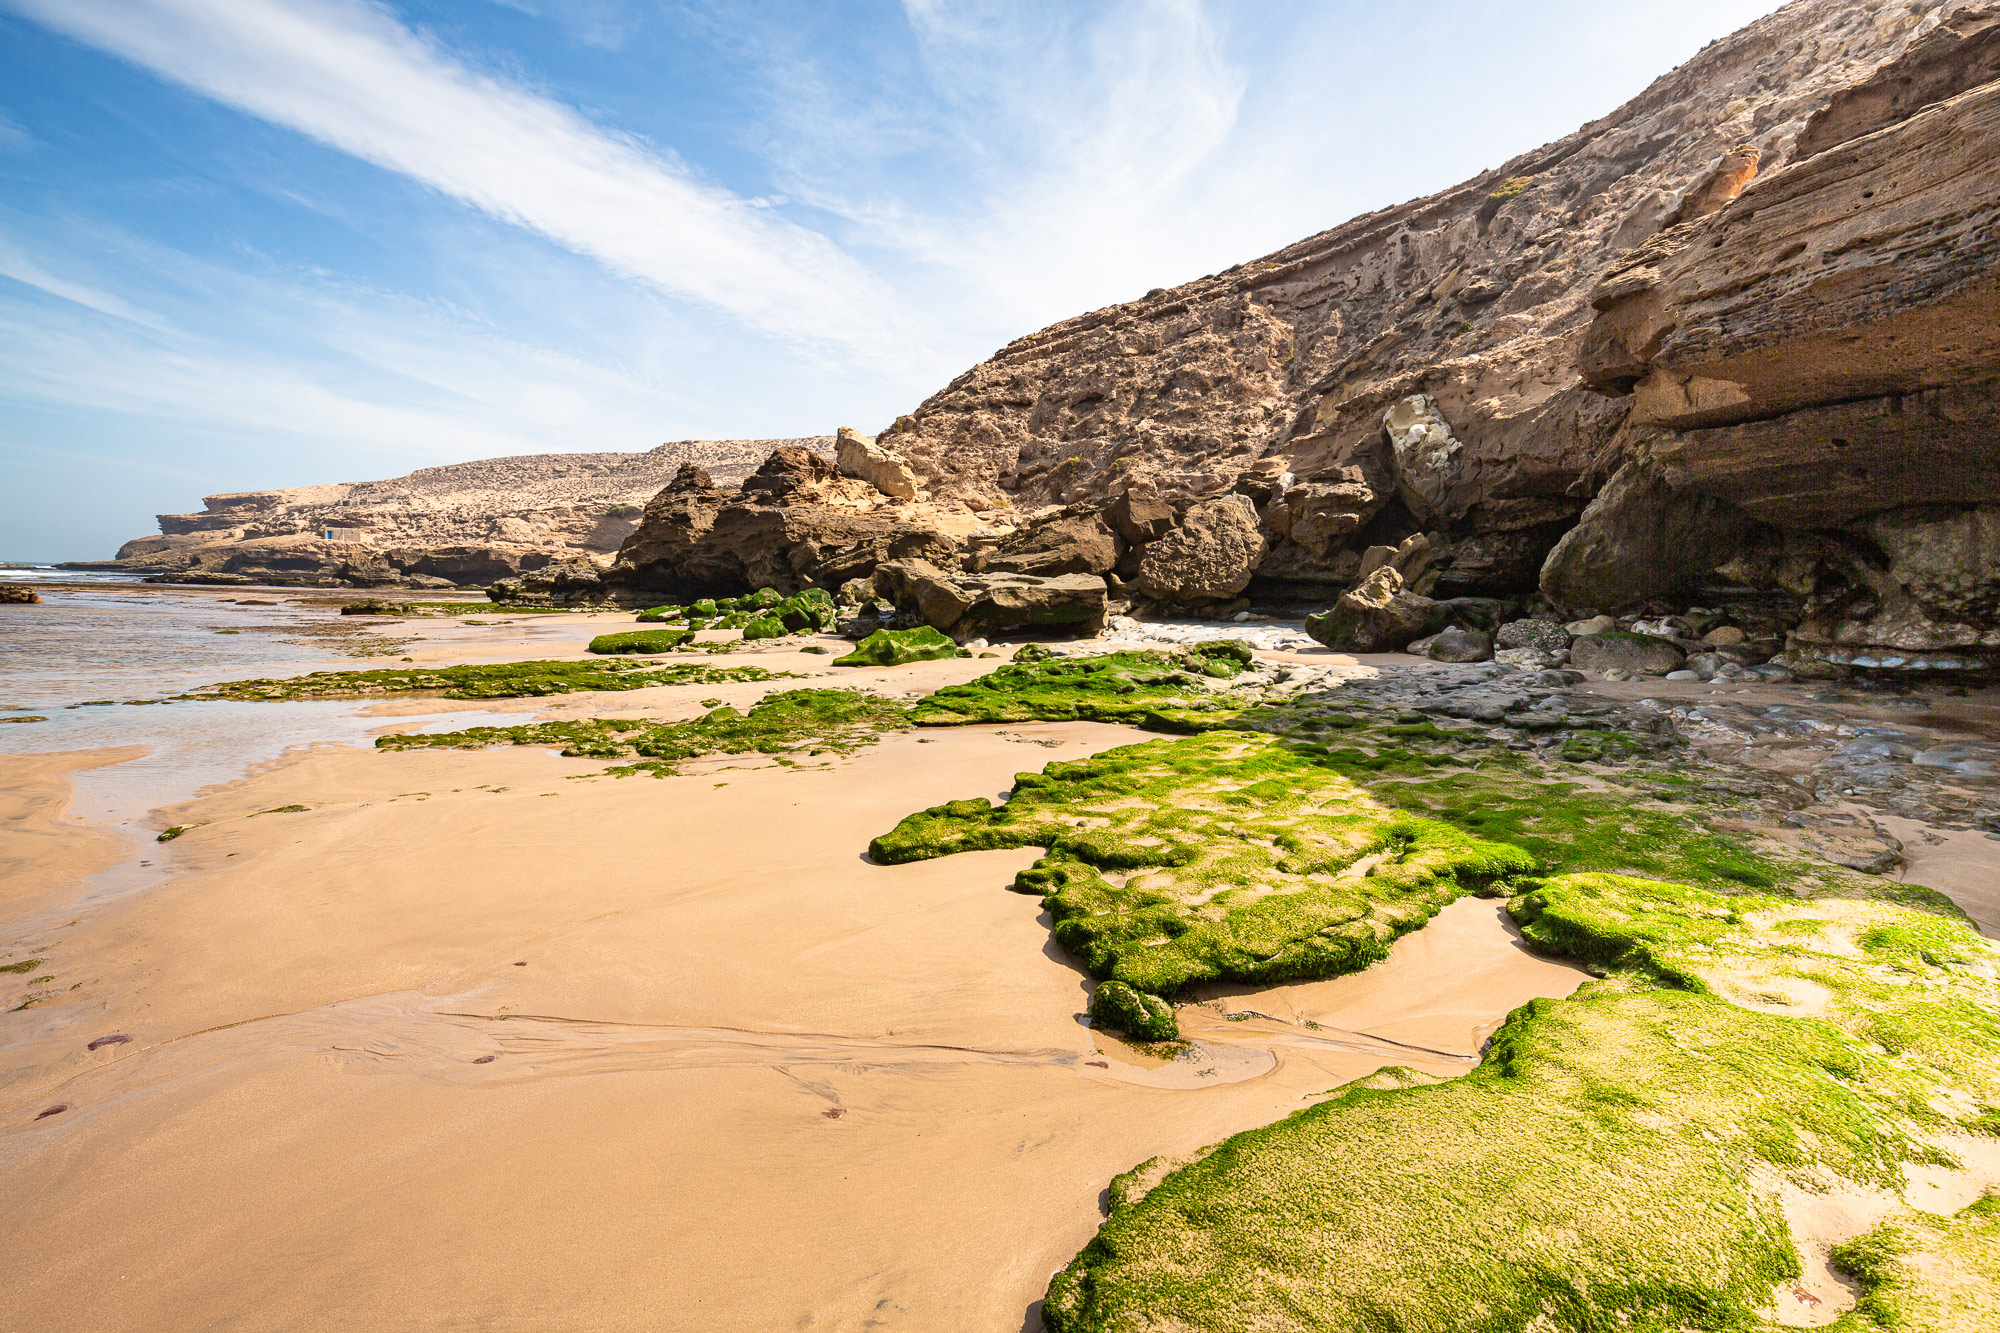 Trek au Maroc Agadir Essaouira algues vertes